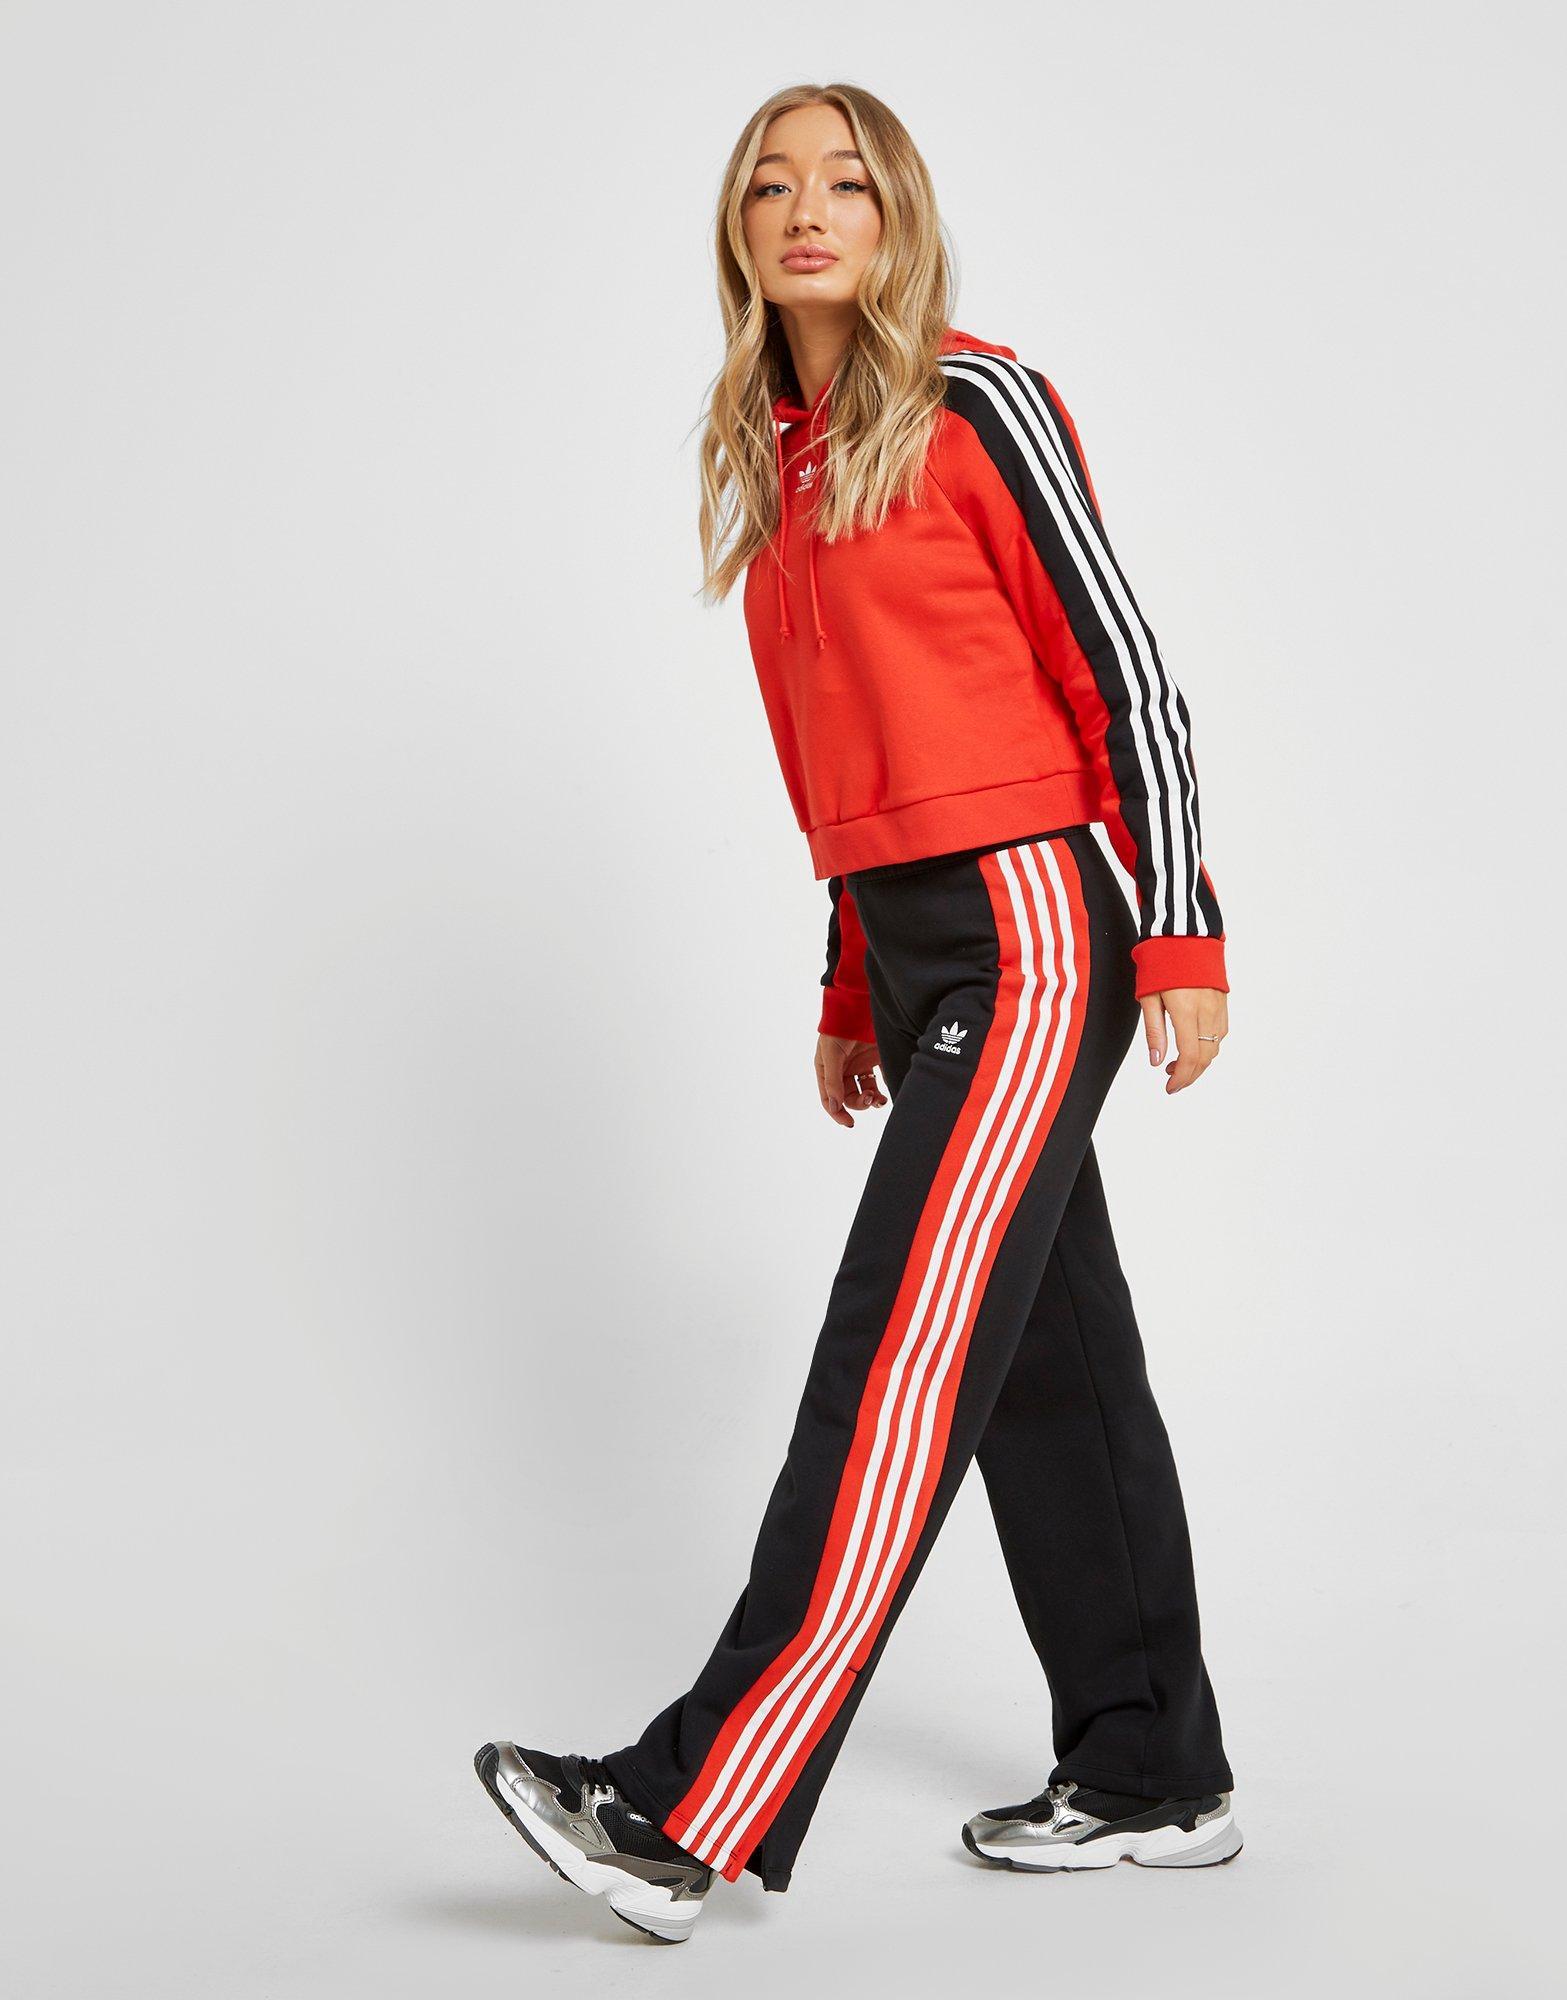 0934ca34ada5 New adidas Women s Originals Running Wide Leg Joggers Black